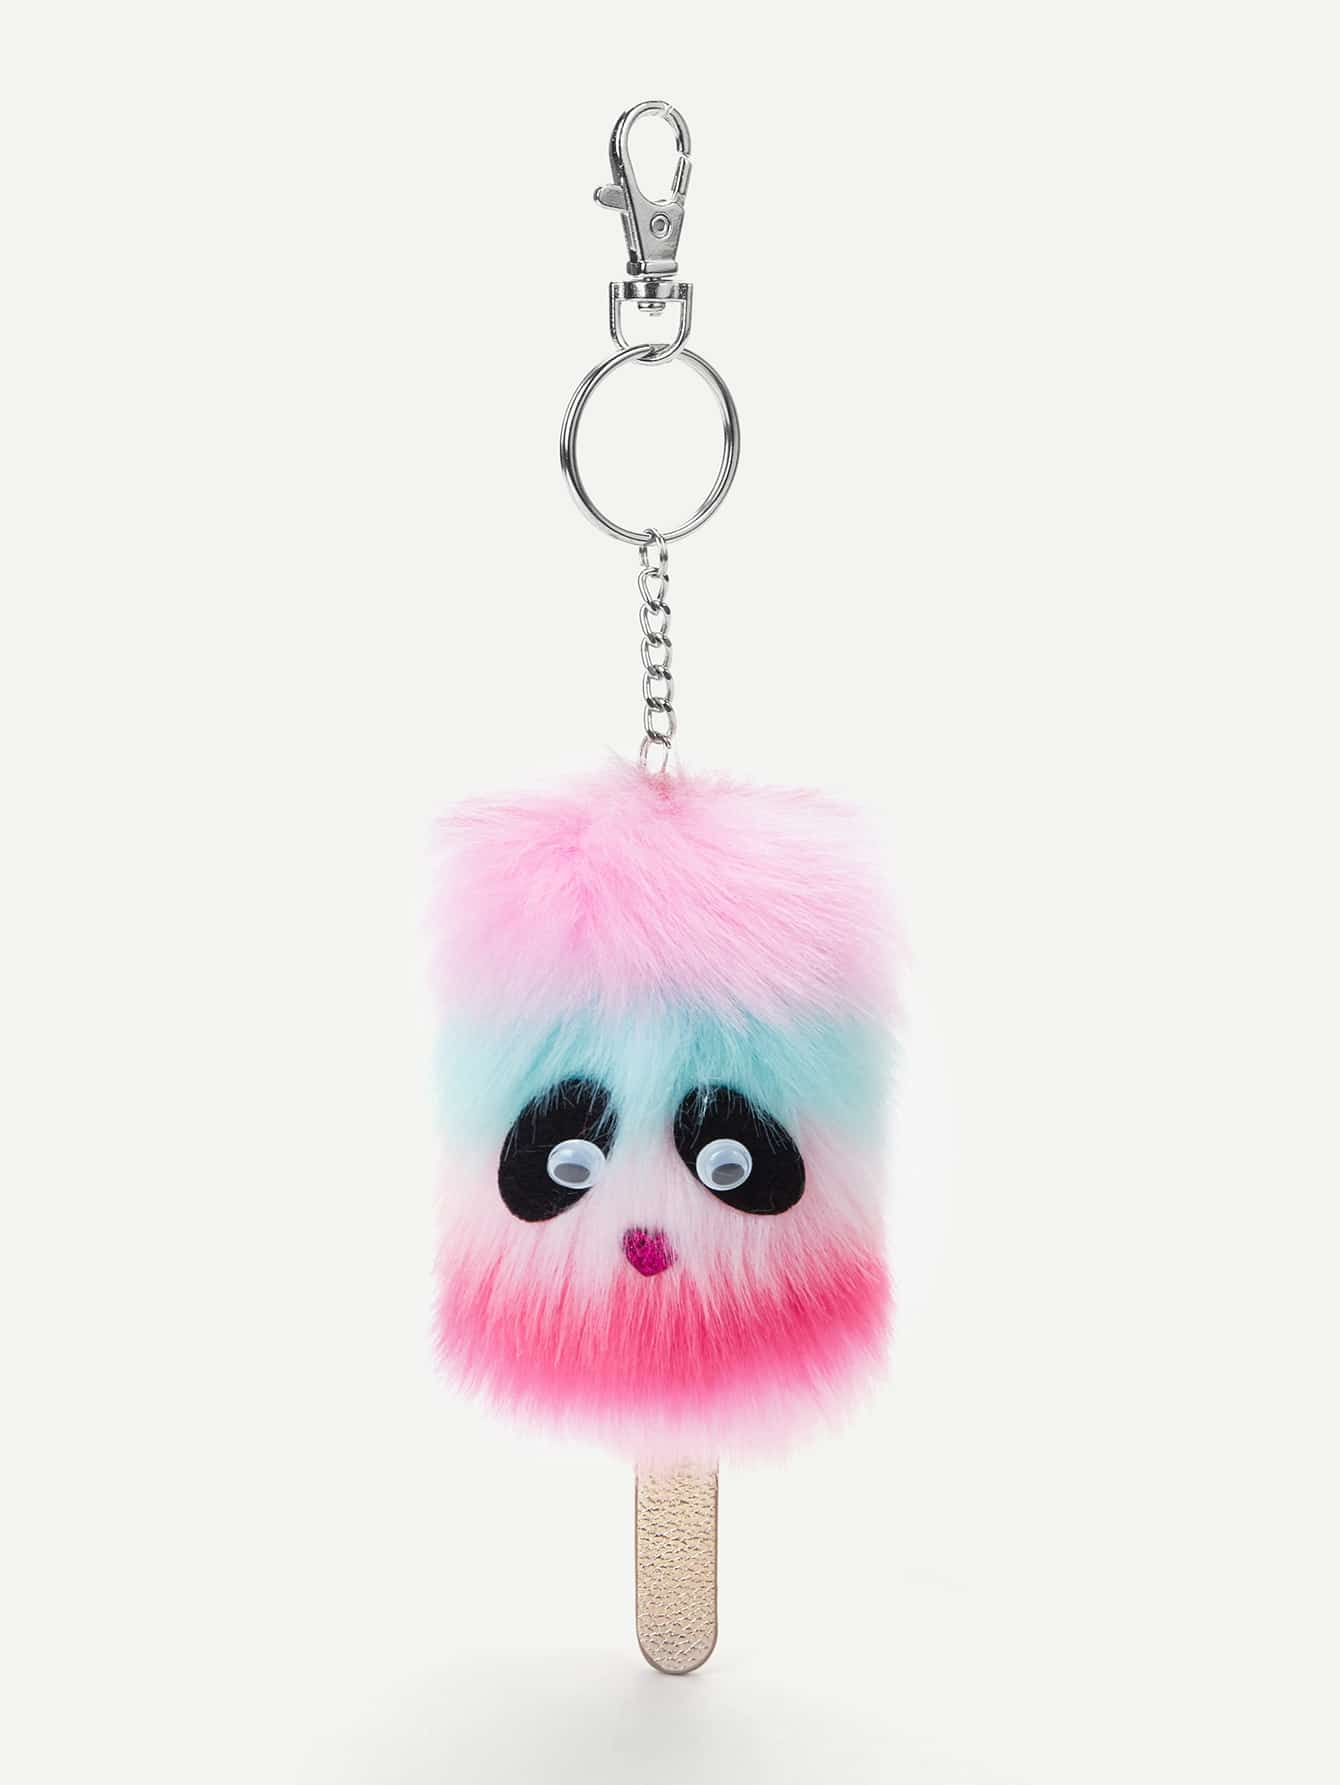 Купить Брелок для ключей в форме мороженое, null, SheIn